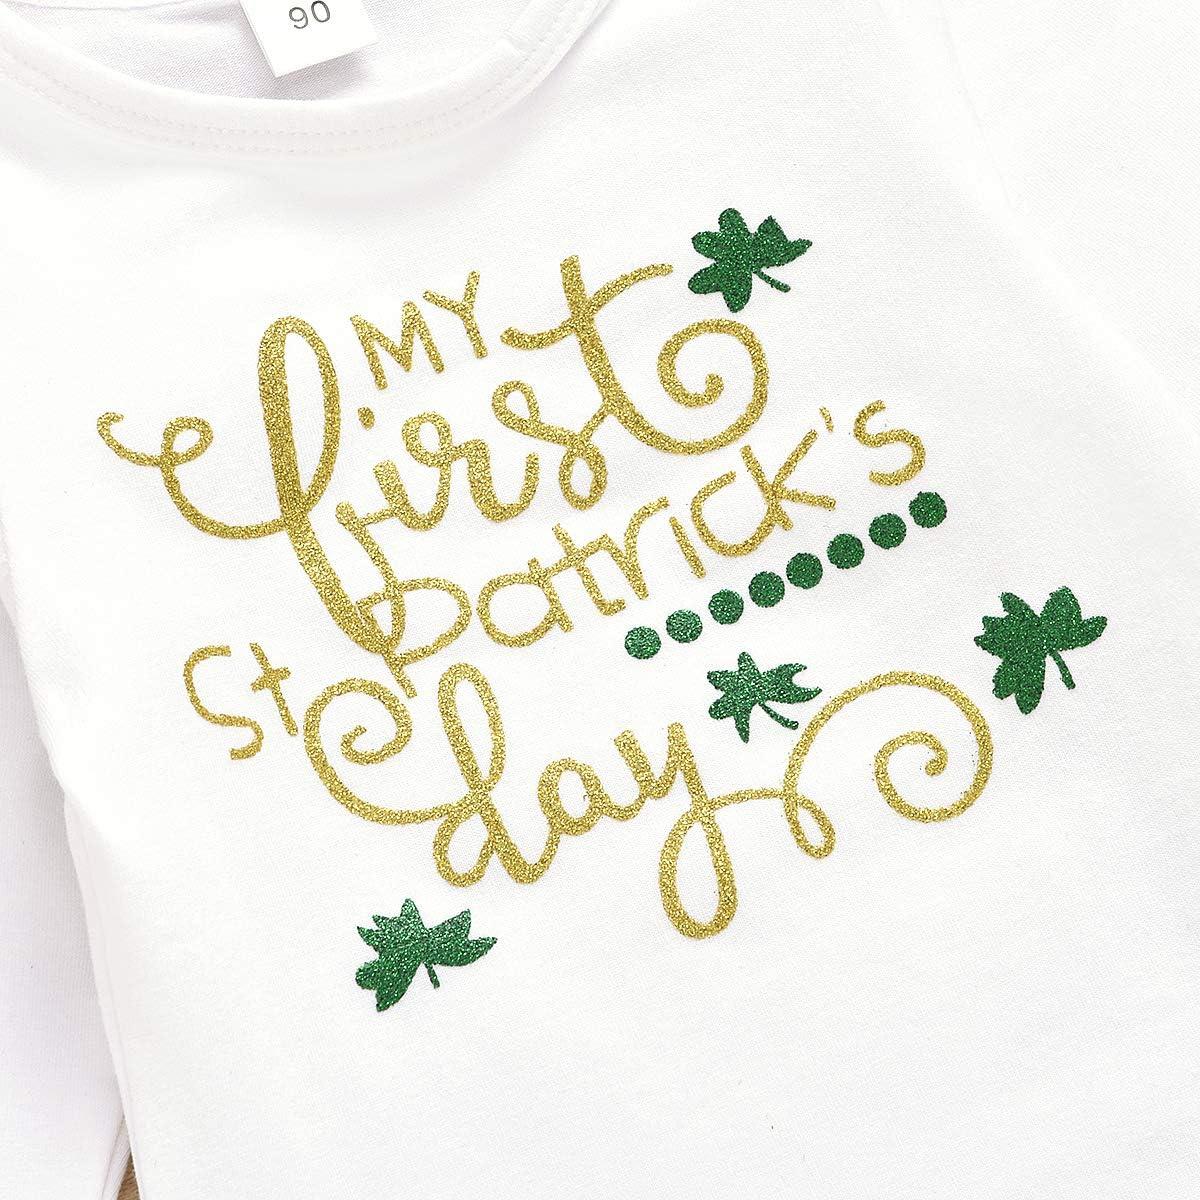 Patricks Day Romper Bodysuit Tutu Skirt Leg Warmers Headband Set Wide.ling 4PCS Infant Baby Girls Clothes My 1st St